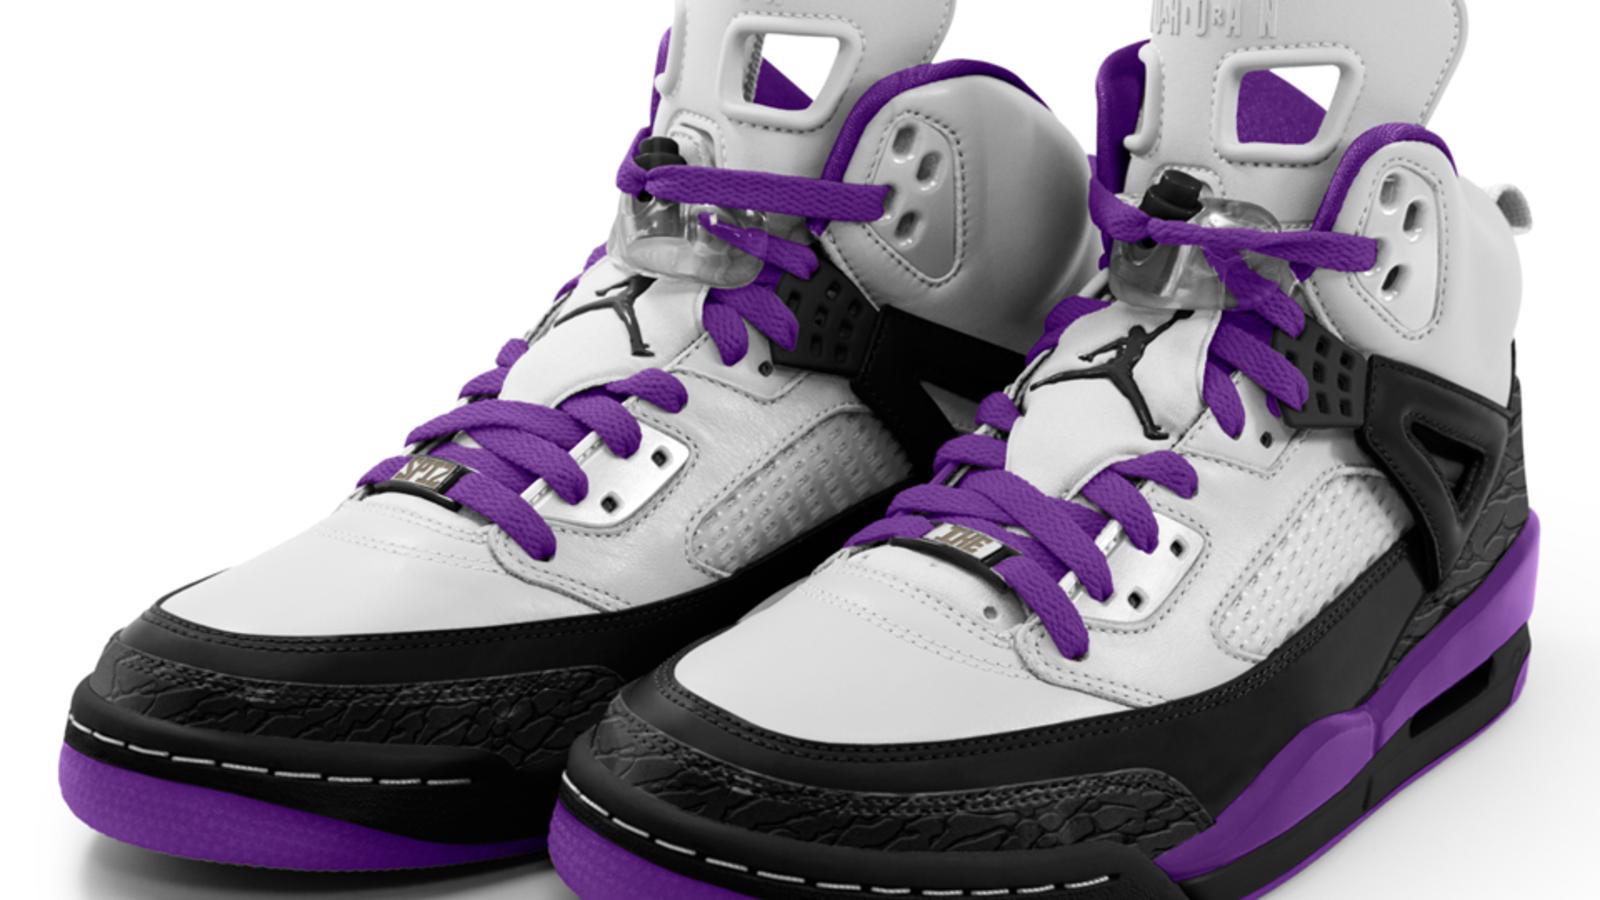 a52897d7724 Jordan Spiz ike on NIKEiD - Nike News